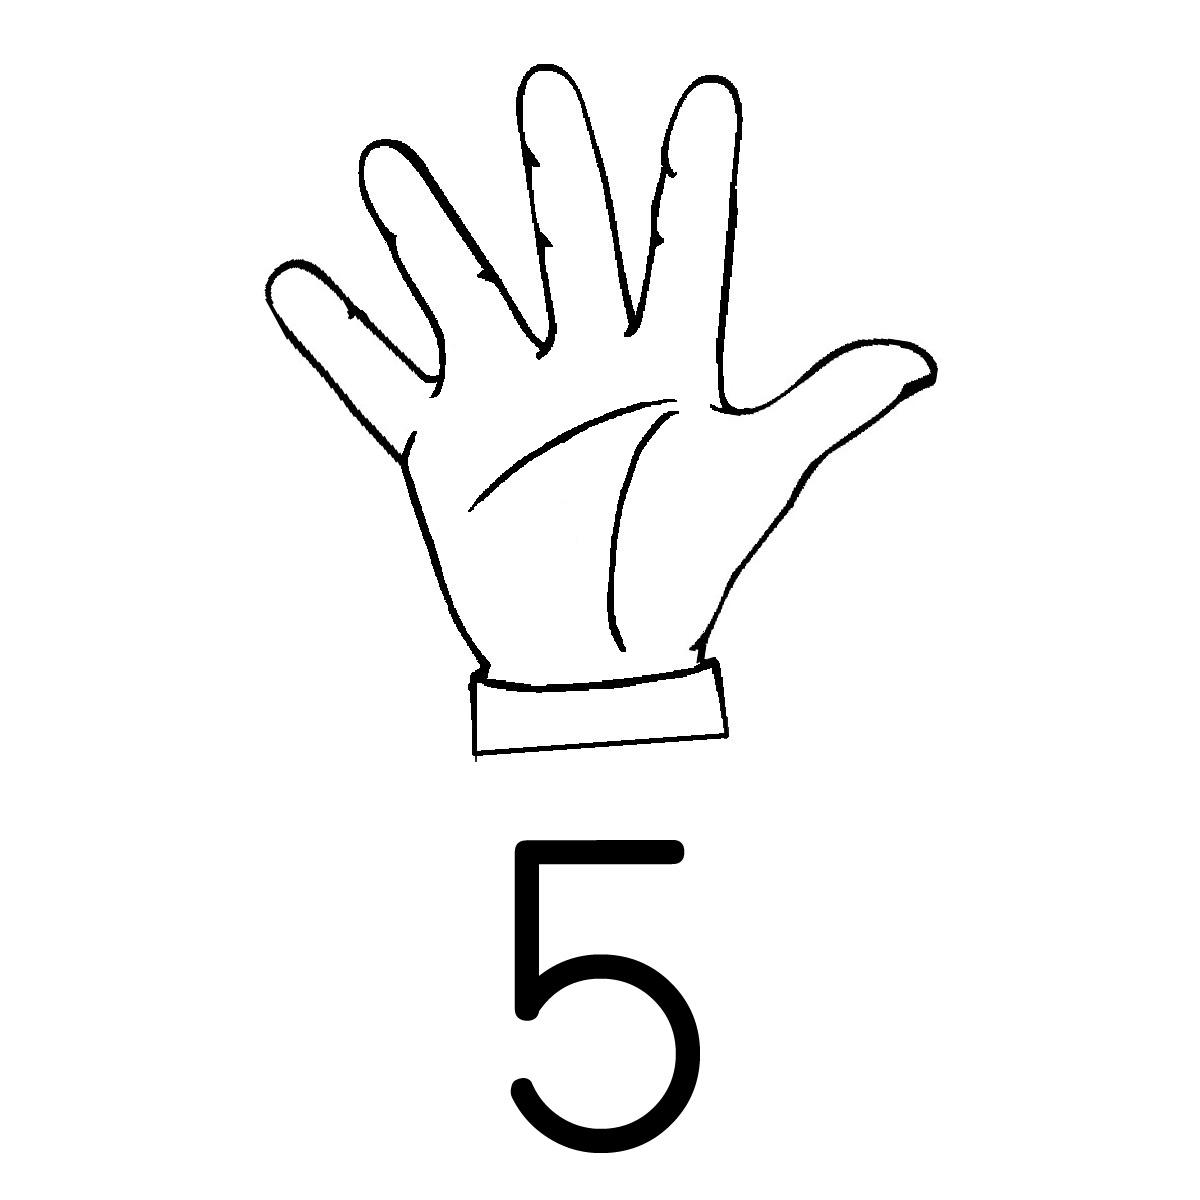 Five Clipart.